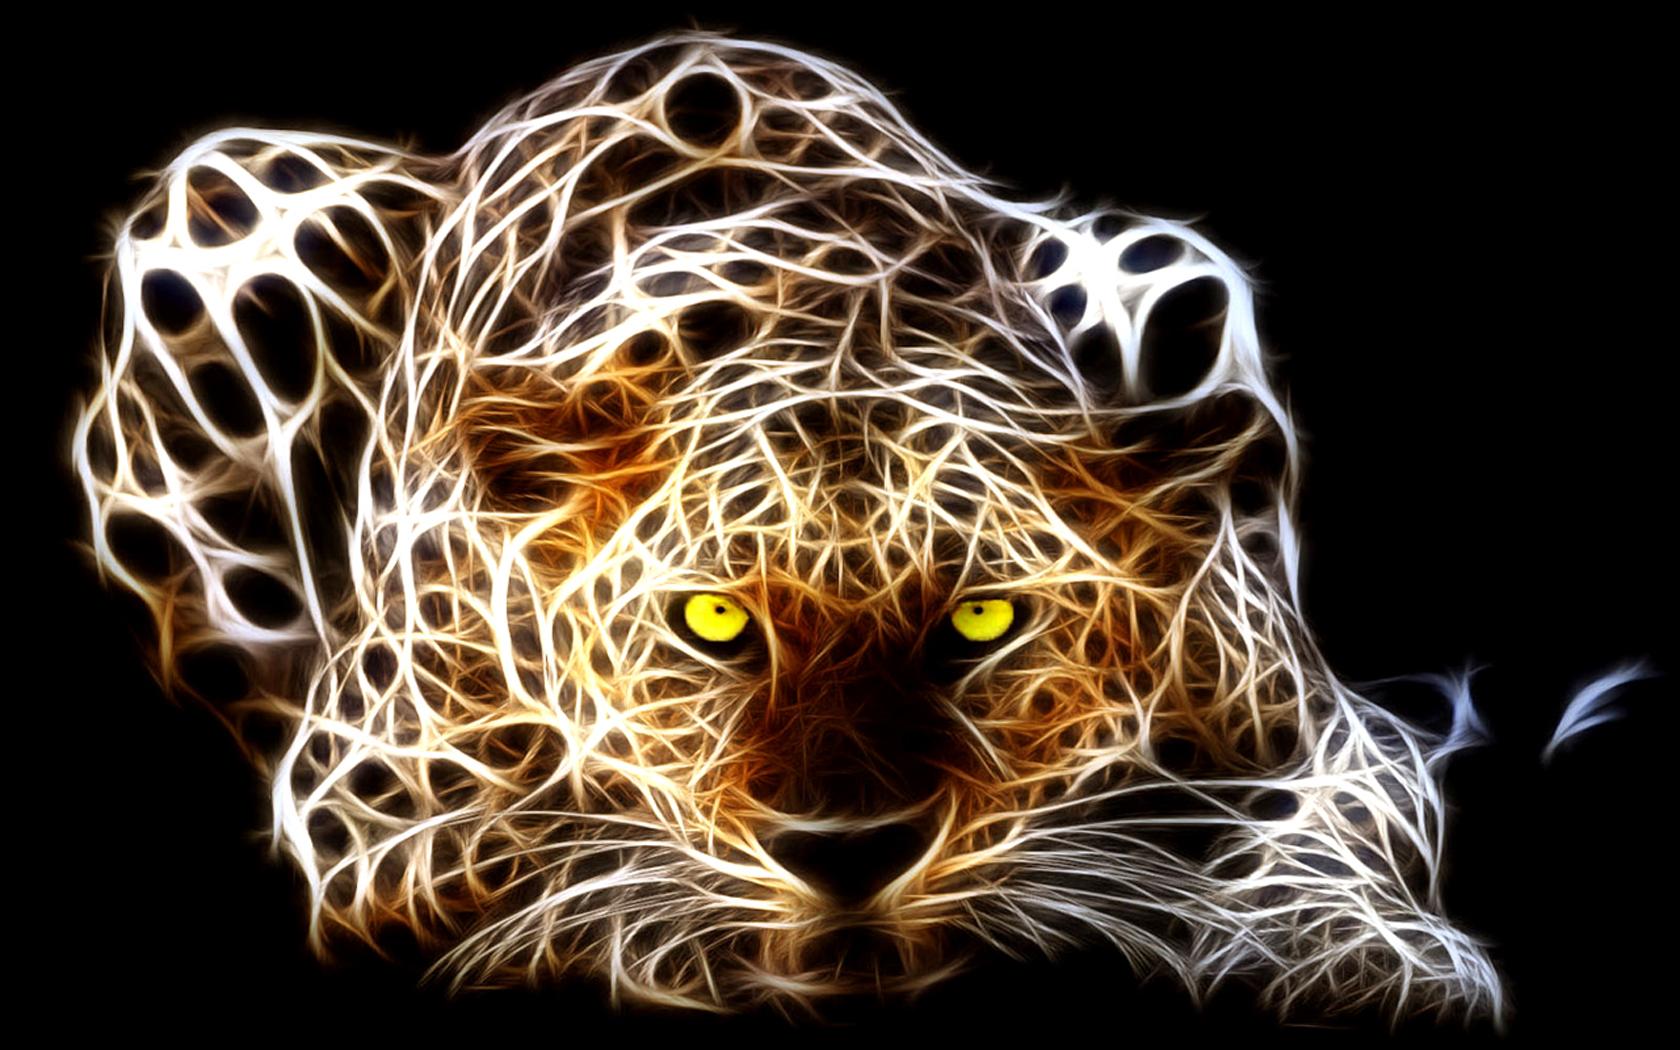 Animated Cheetah Wallpaper fractal cheetah wallpapers